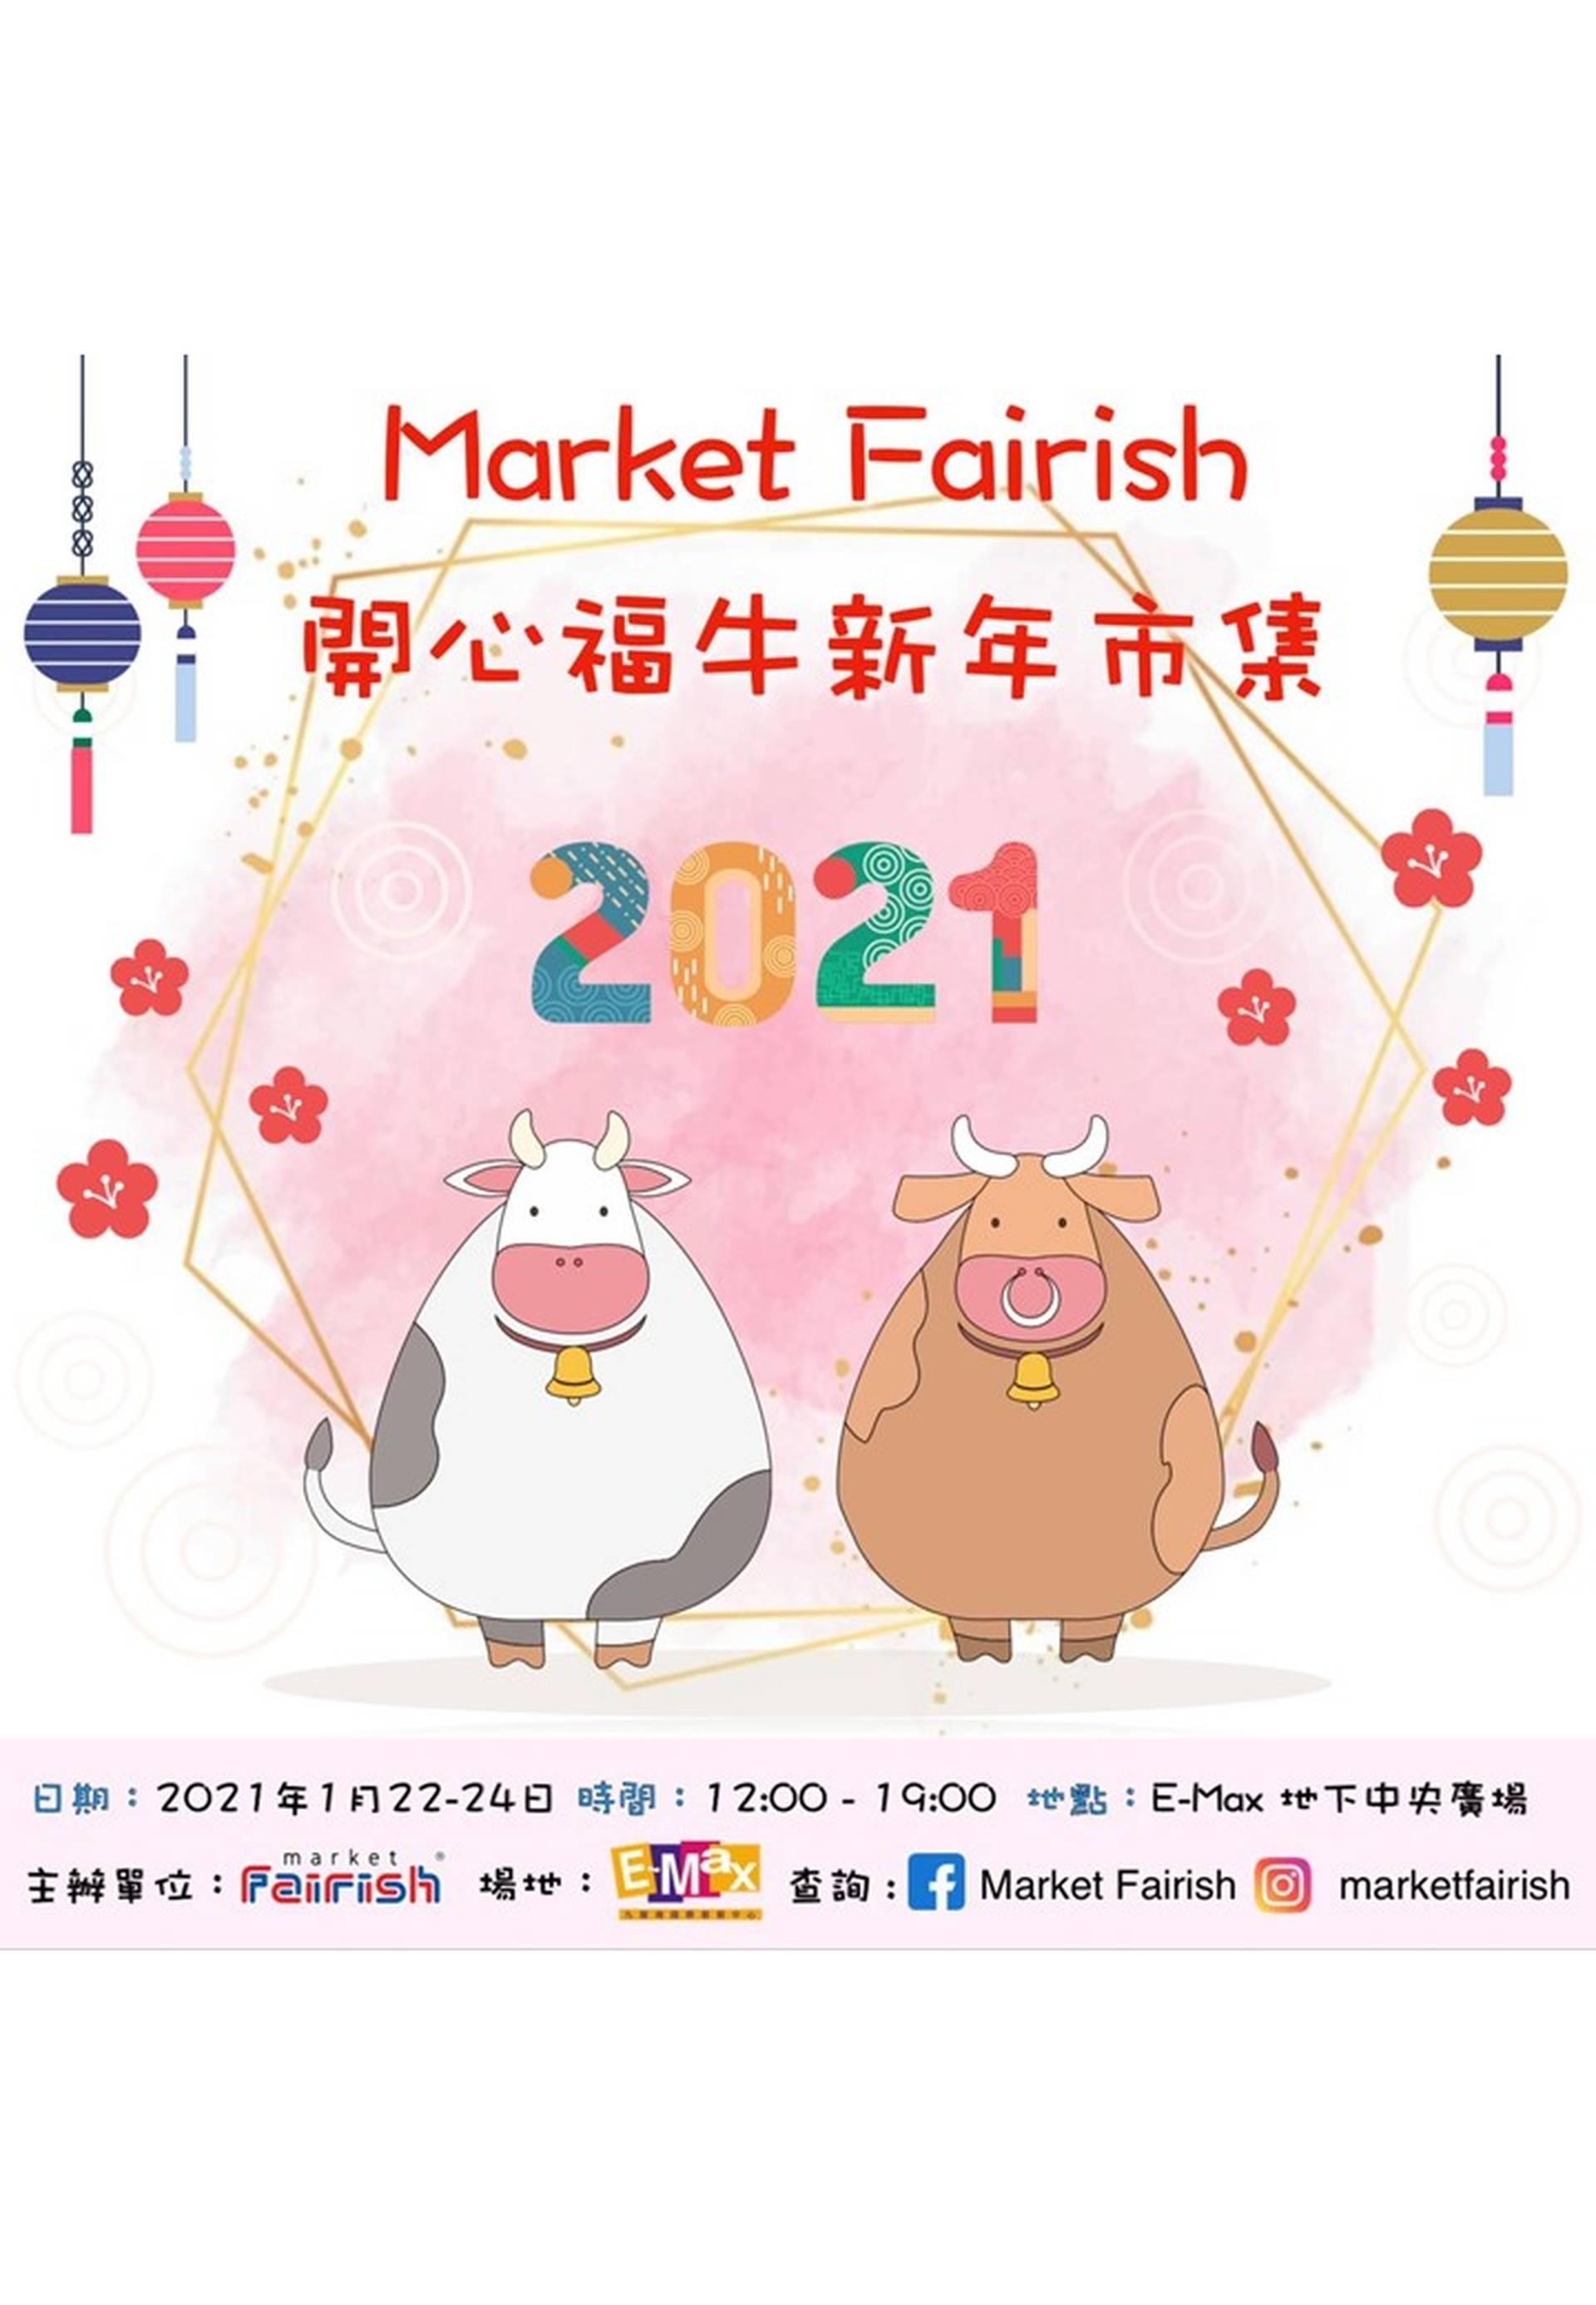 Market Fairish 開心福牛新年市集@EMax(九展)